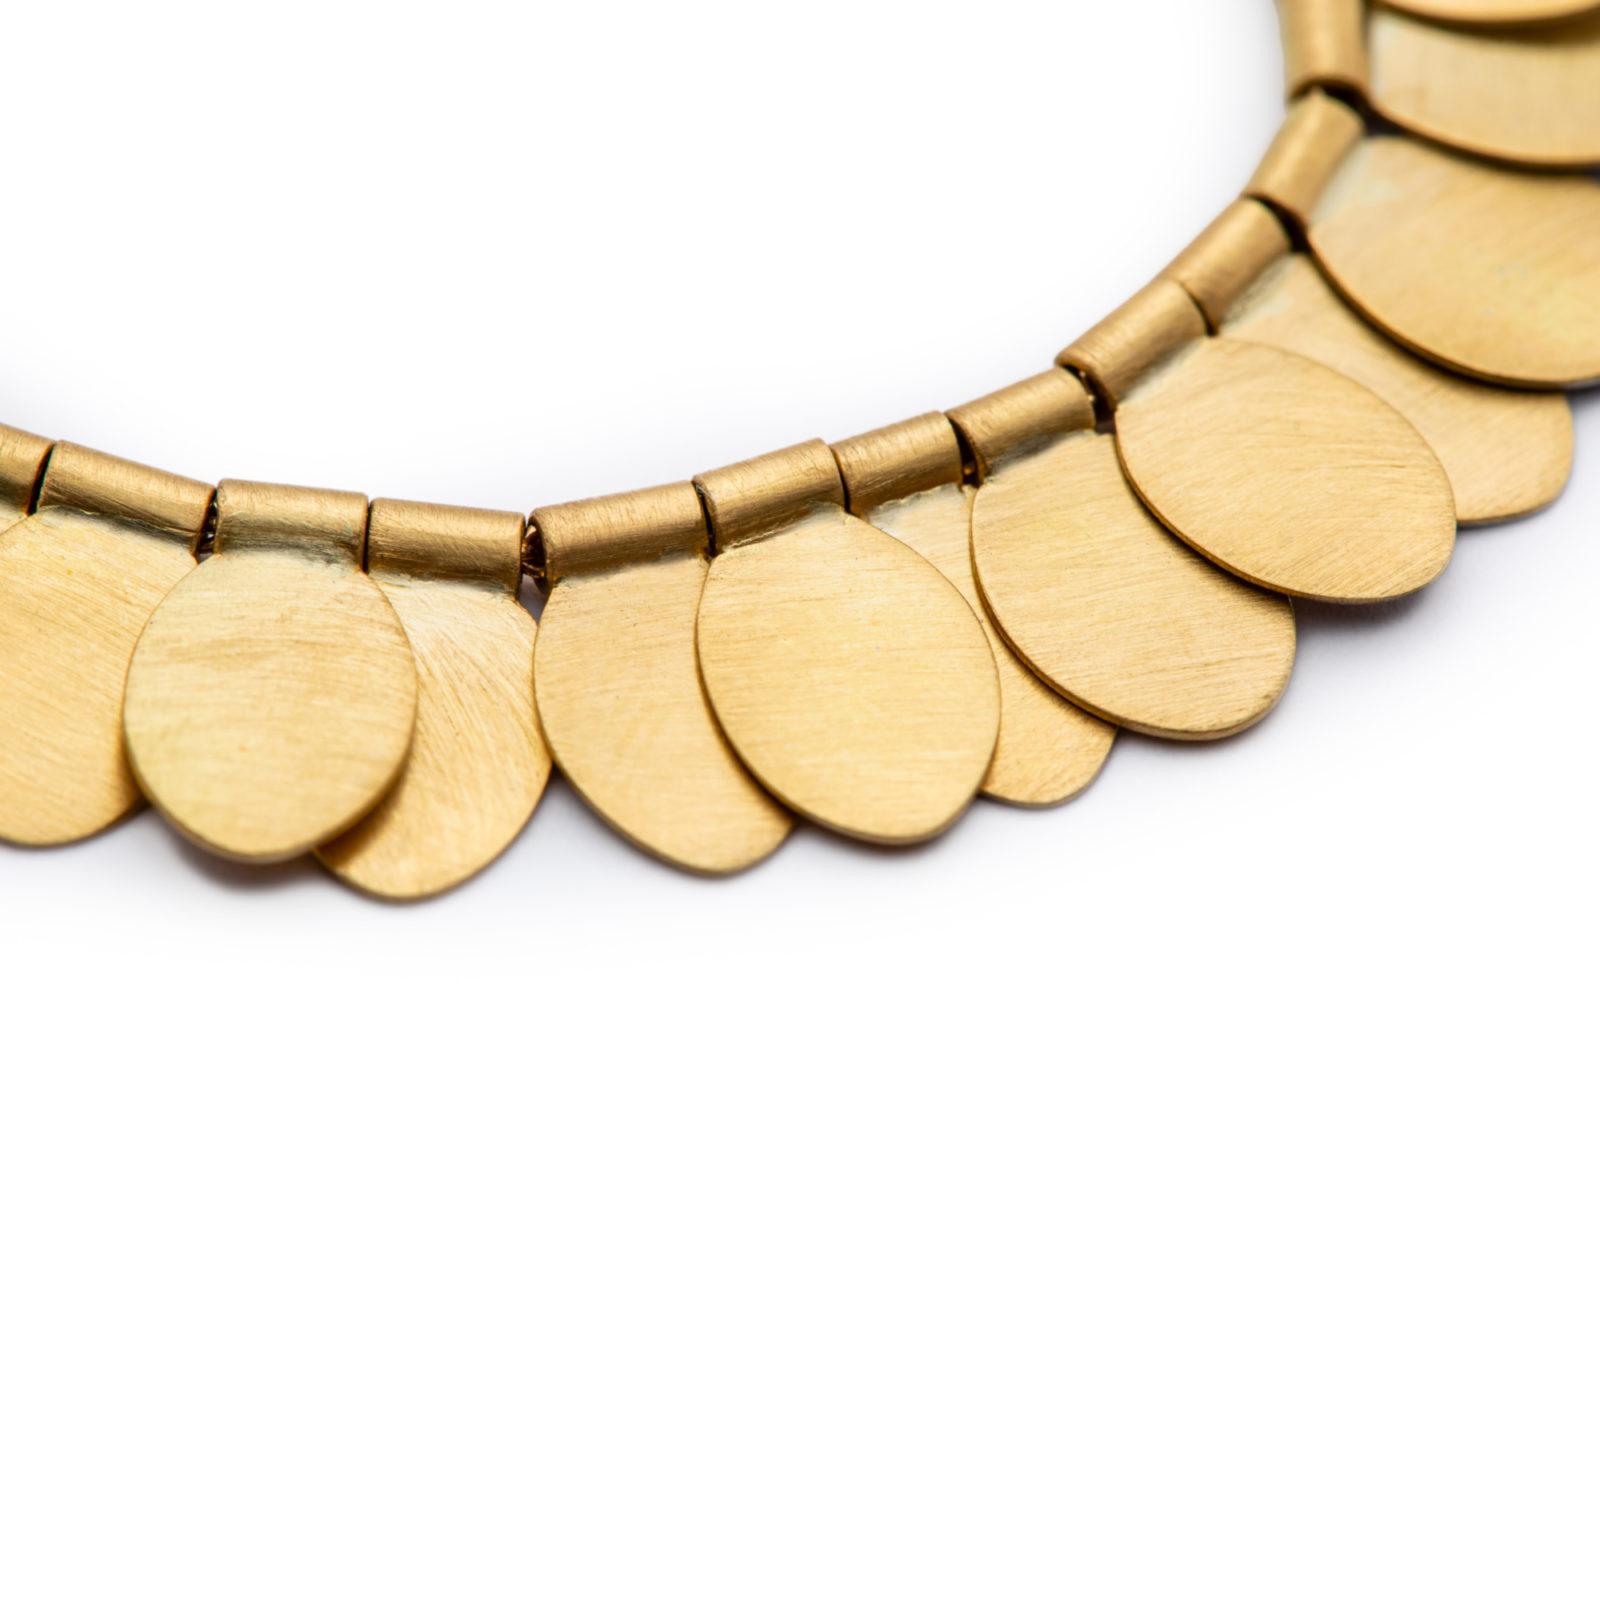 Sia Taylor FB1 YRAIN Rainbow Gold Bracelet Back C